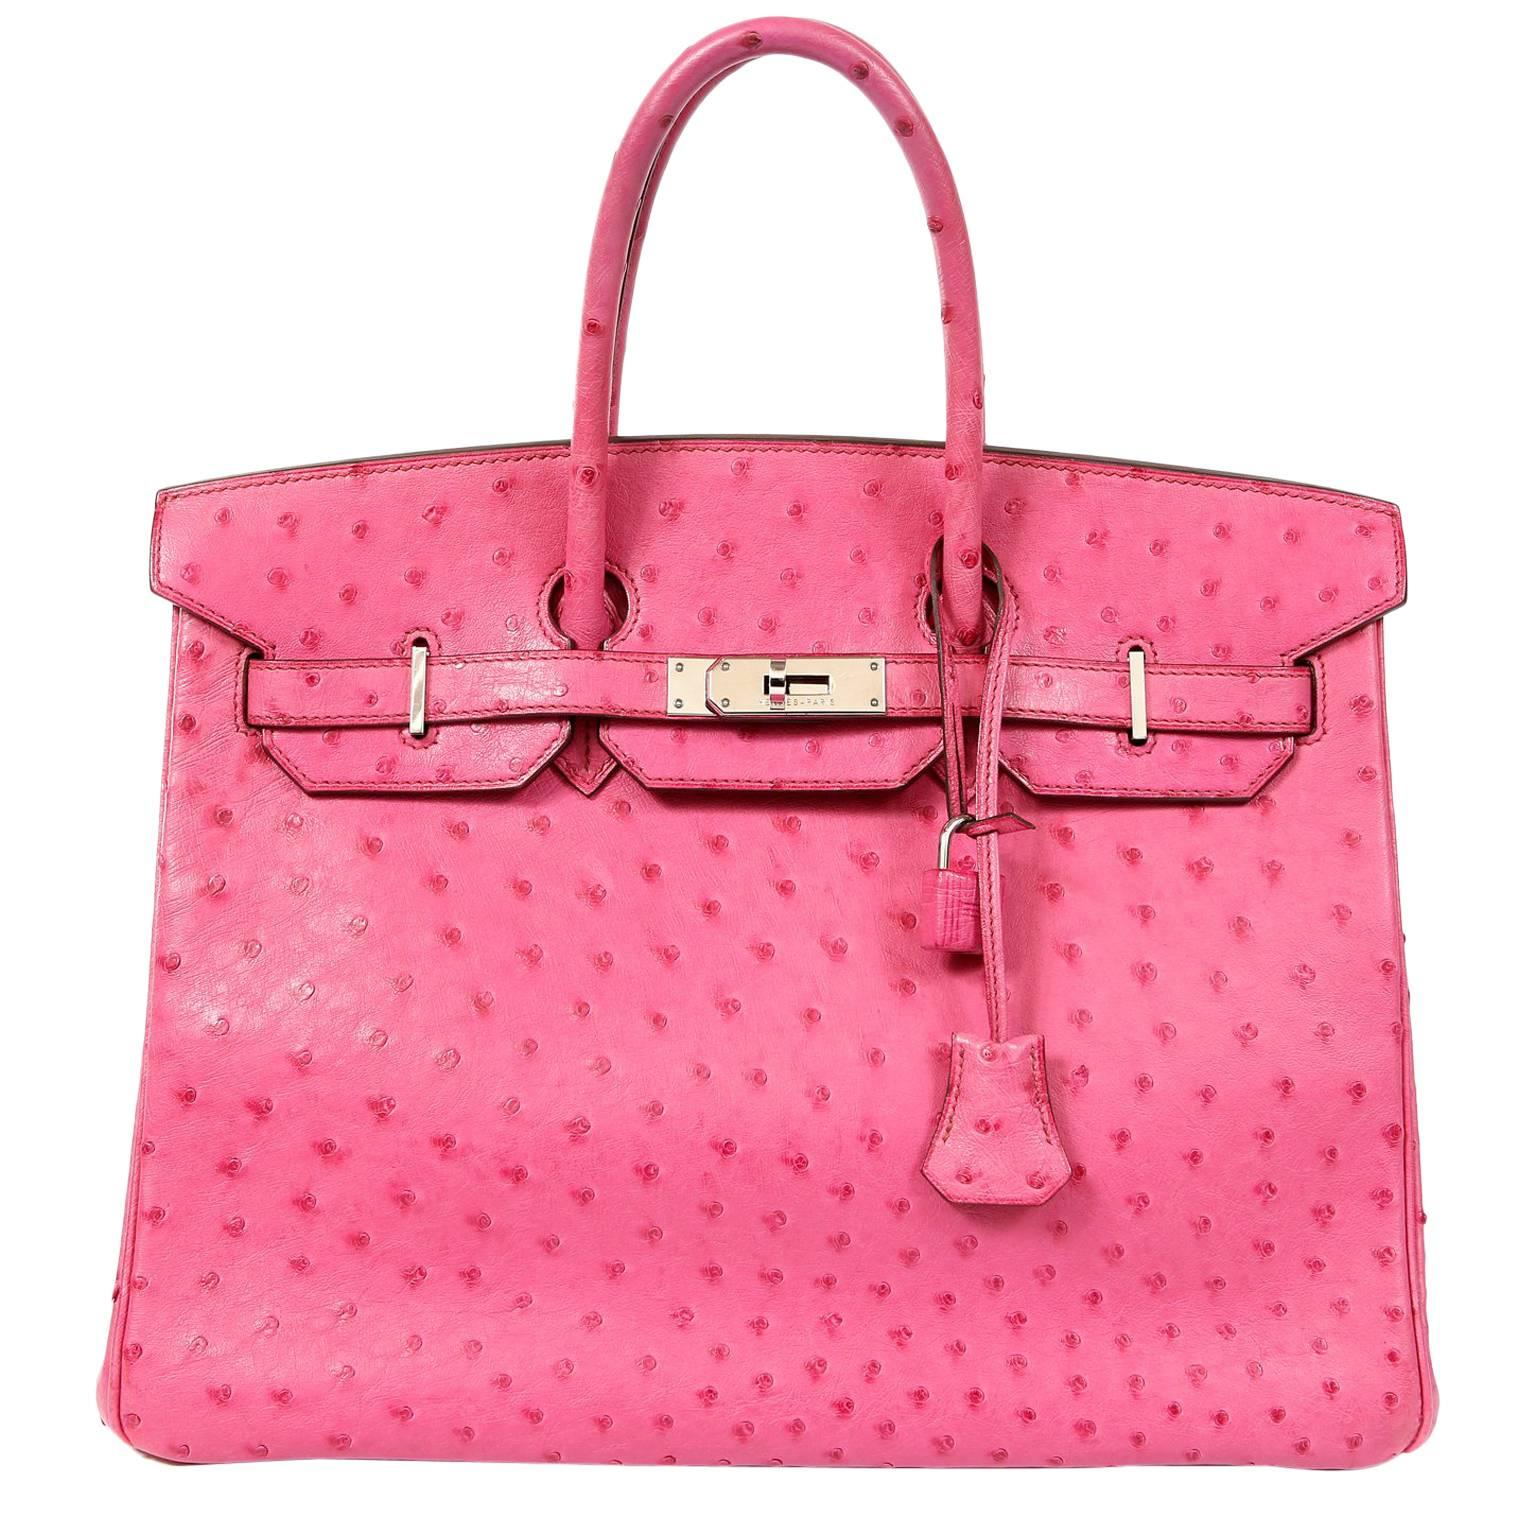 ... coupon hermès pink ostrich 35 cm birkin bag for sale bbdbc 1f0ad b0c1743c116a1